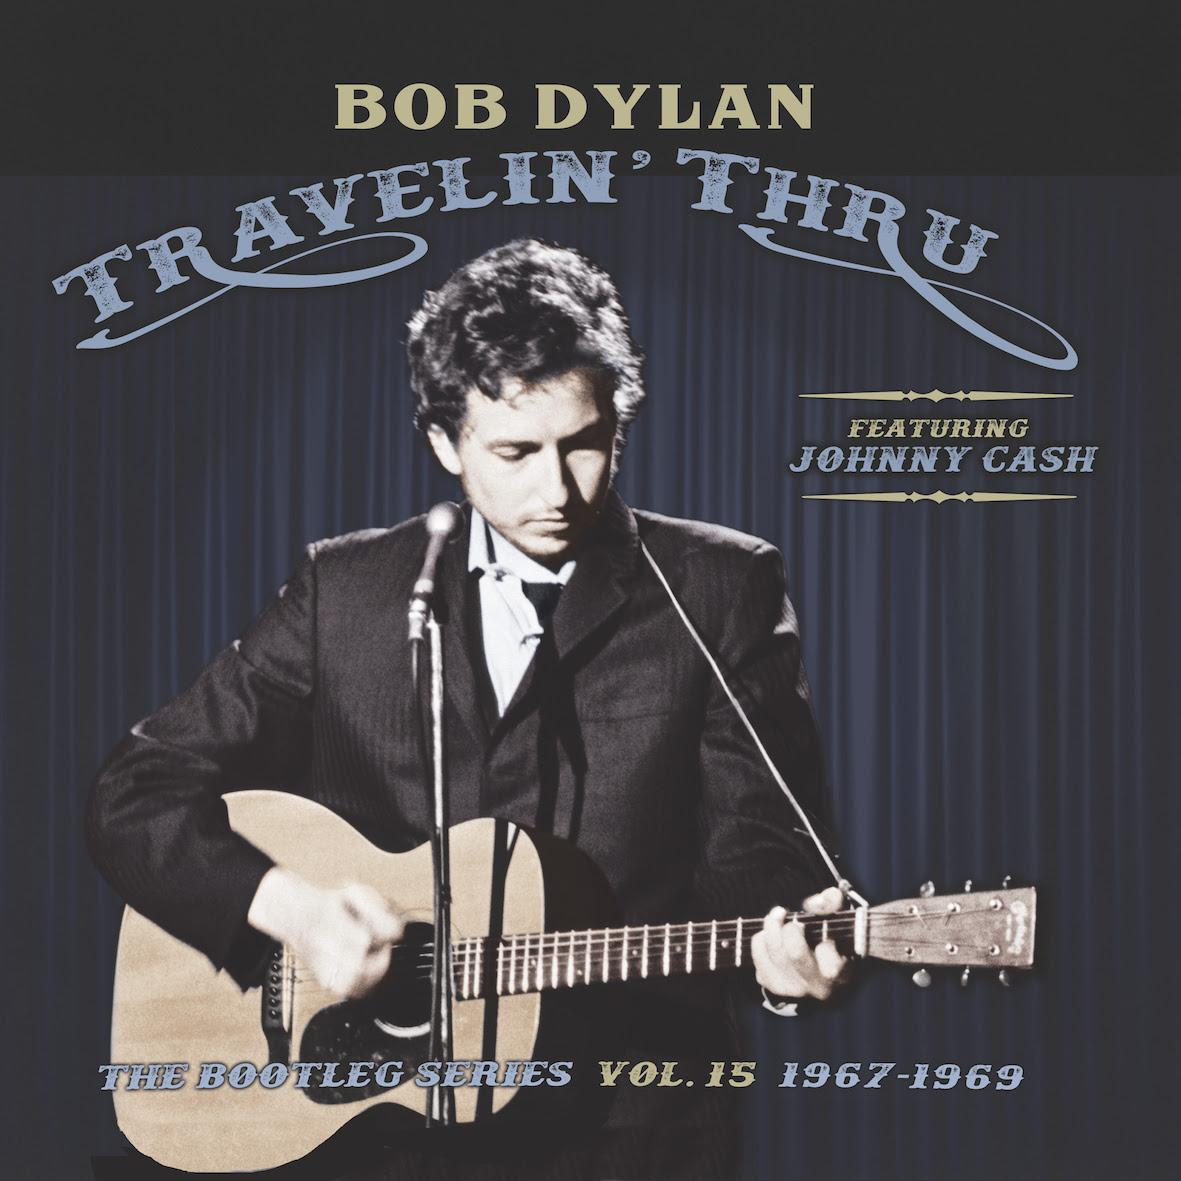 Bob Dylan Johnny Cash Travelin Thru 1967-69 Bootleg Series 15